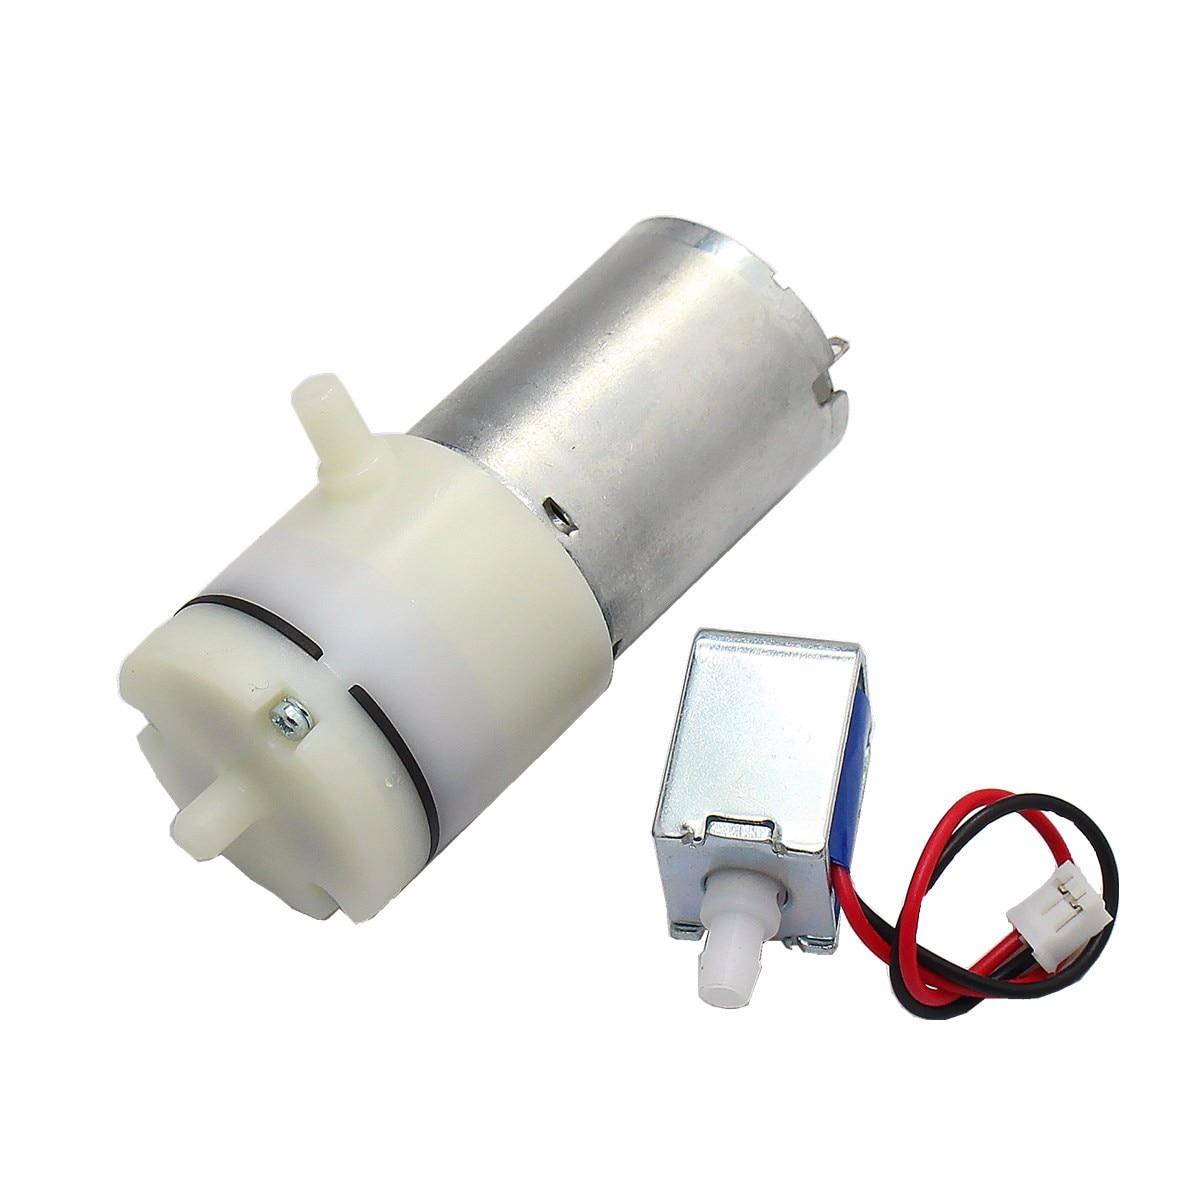 Dc 3,7 V Vakuum Mikroluftpumpe Mit 5 V Magnetventil Neue Pumpen, Teile Und Zubehör Sanitär